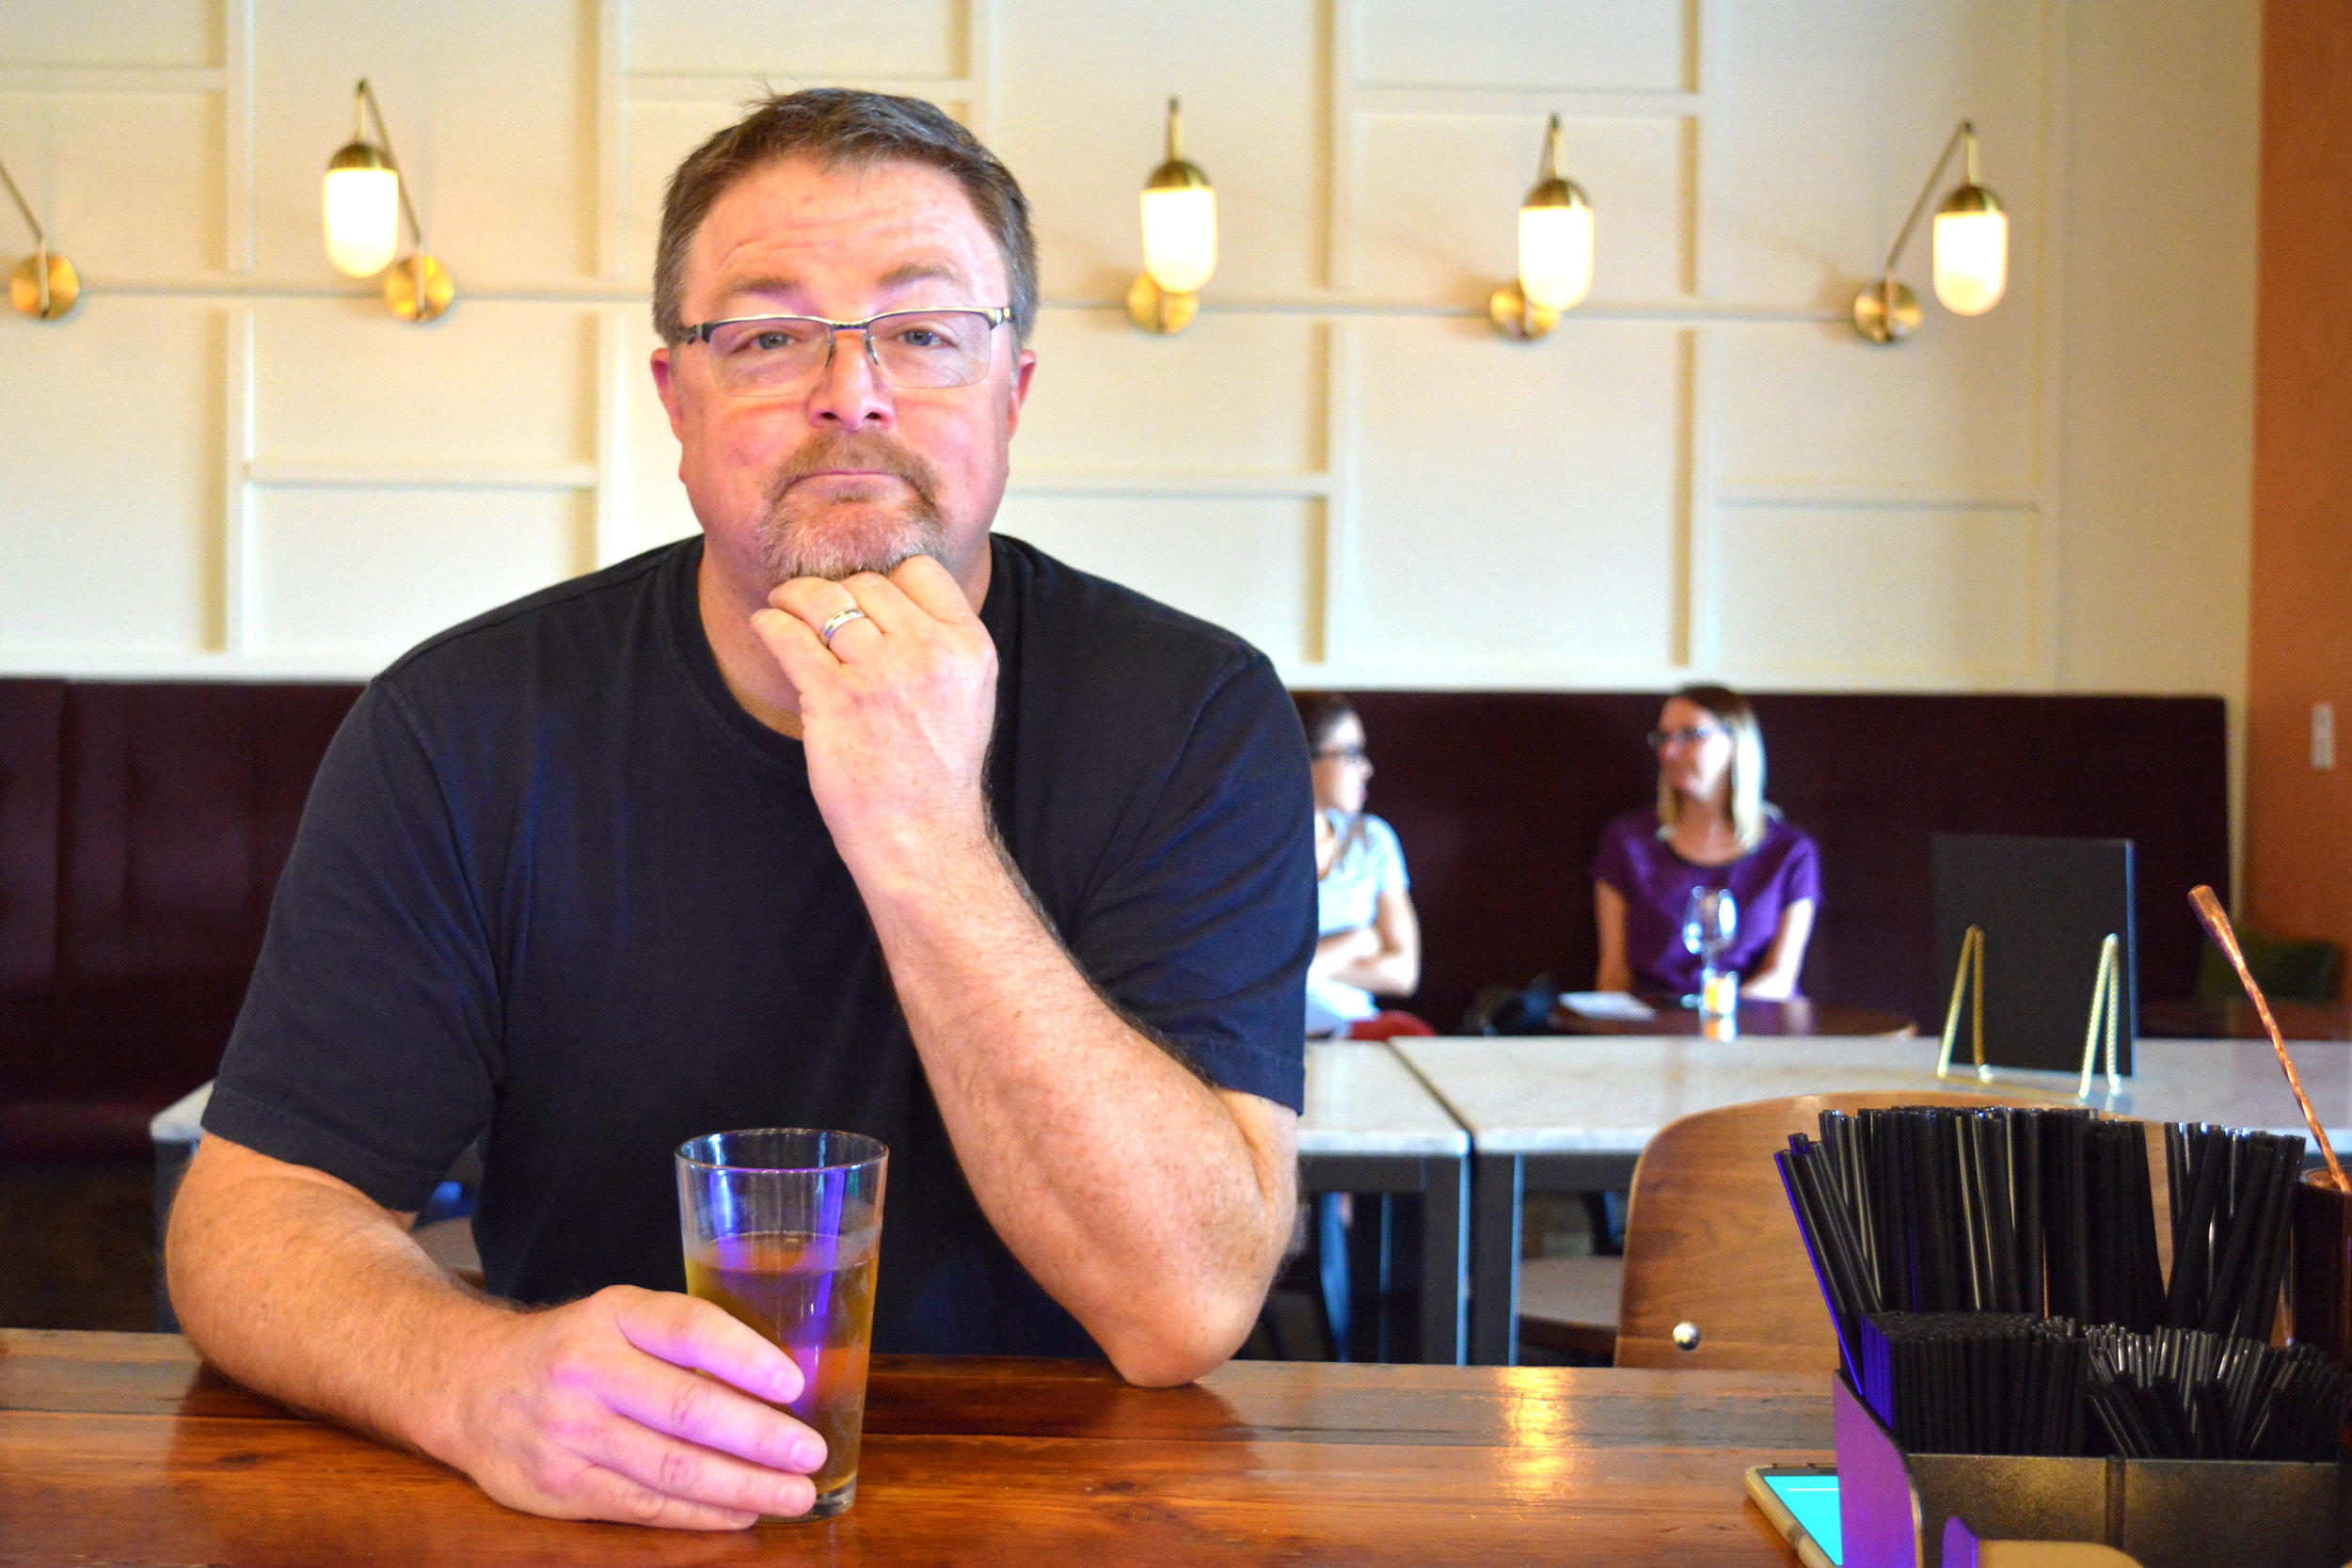 Dennis Dunwoodie drinking an Anderson Valley Gose